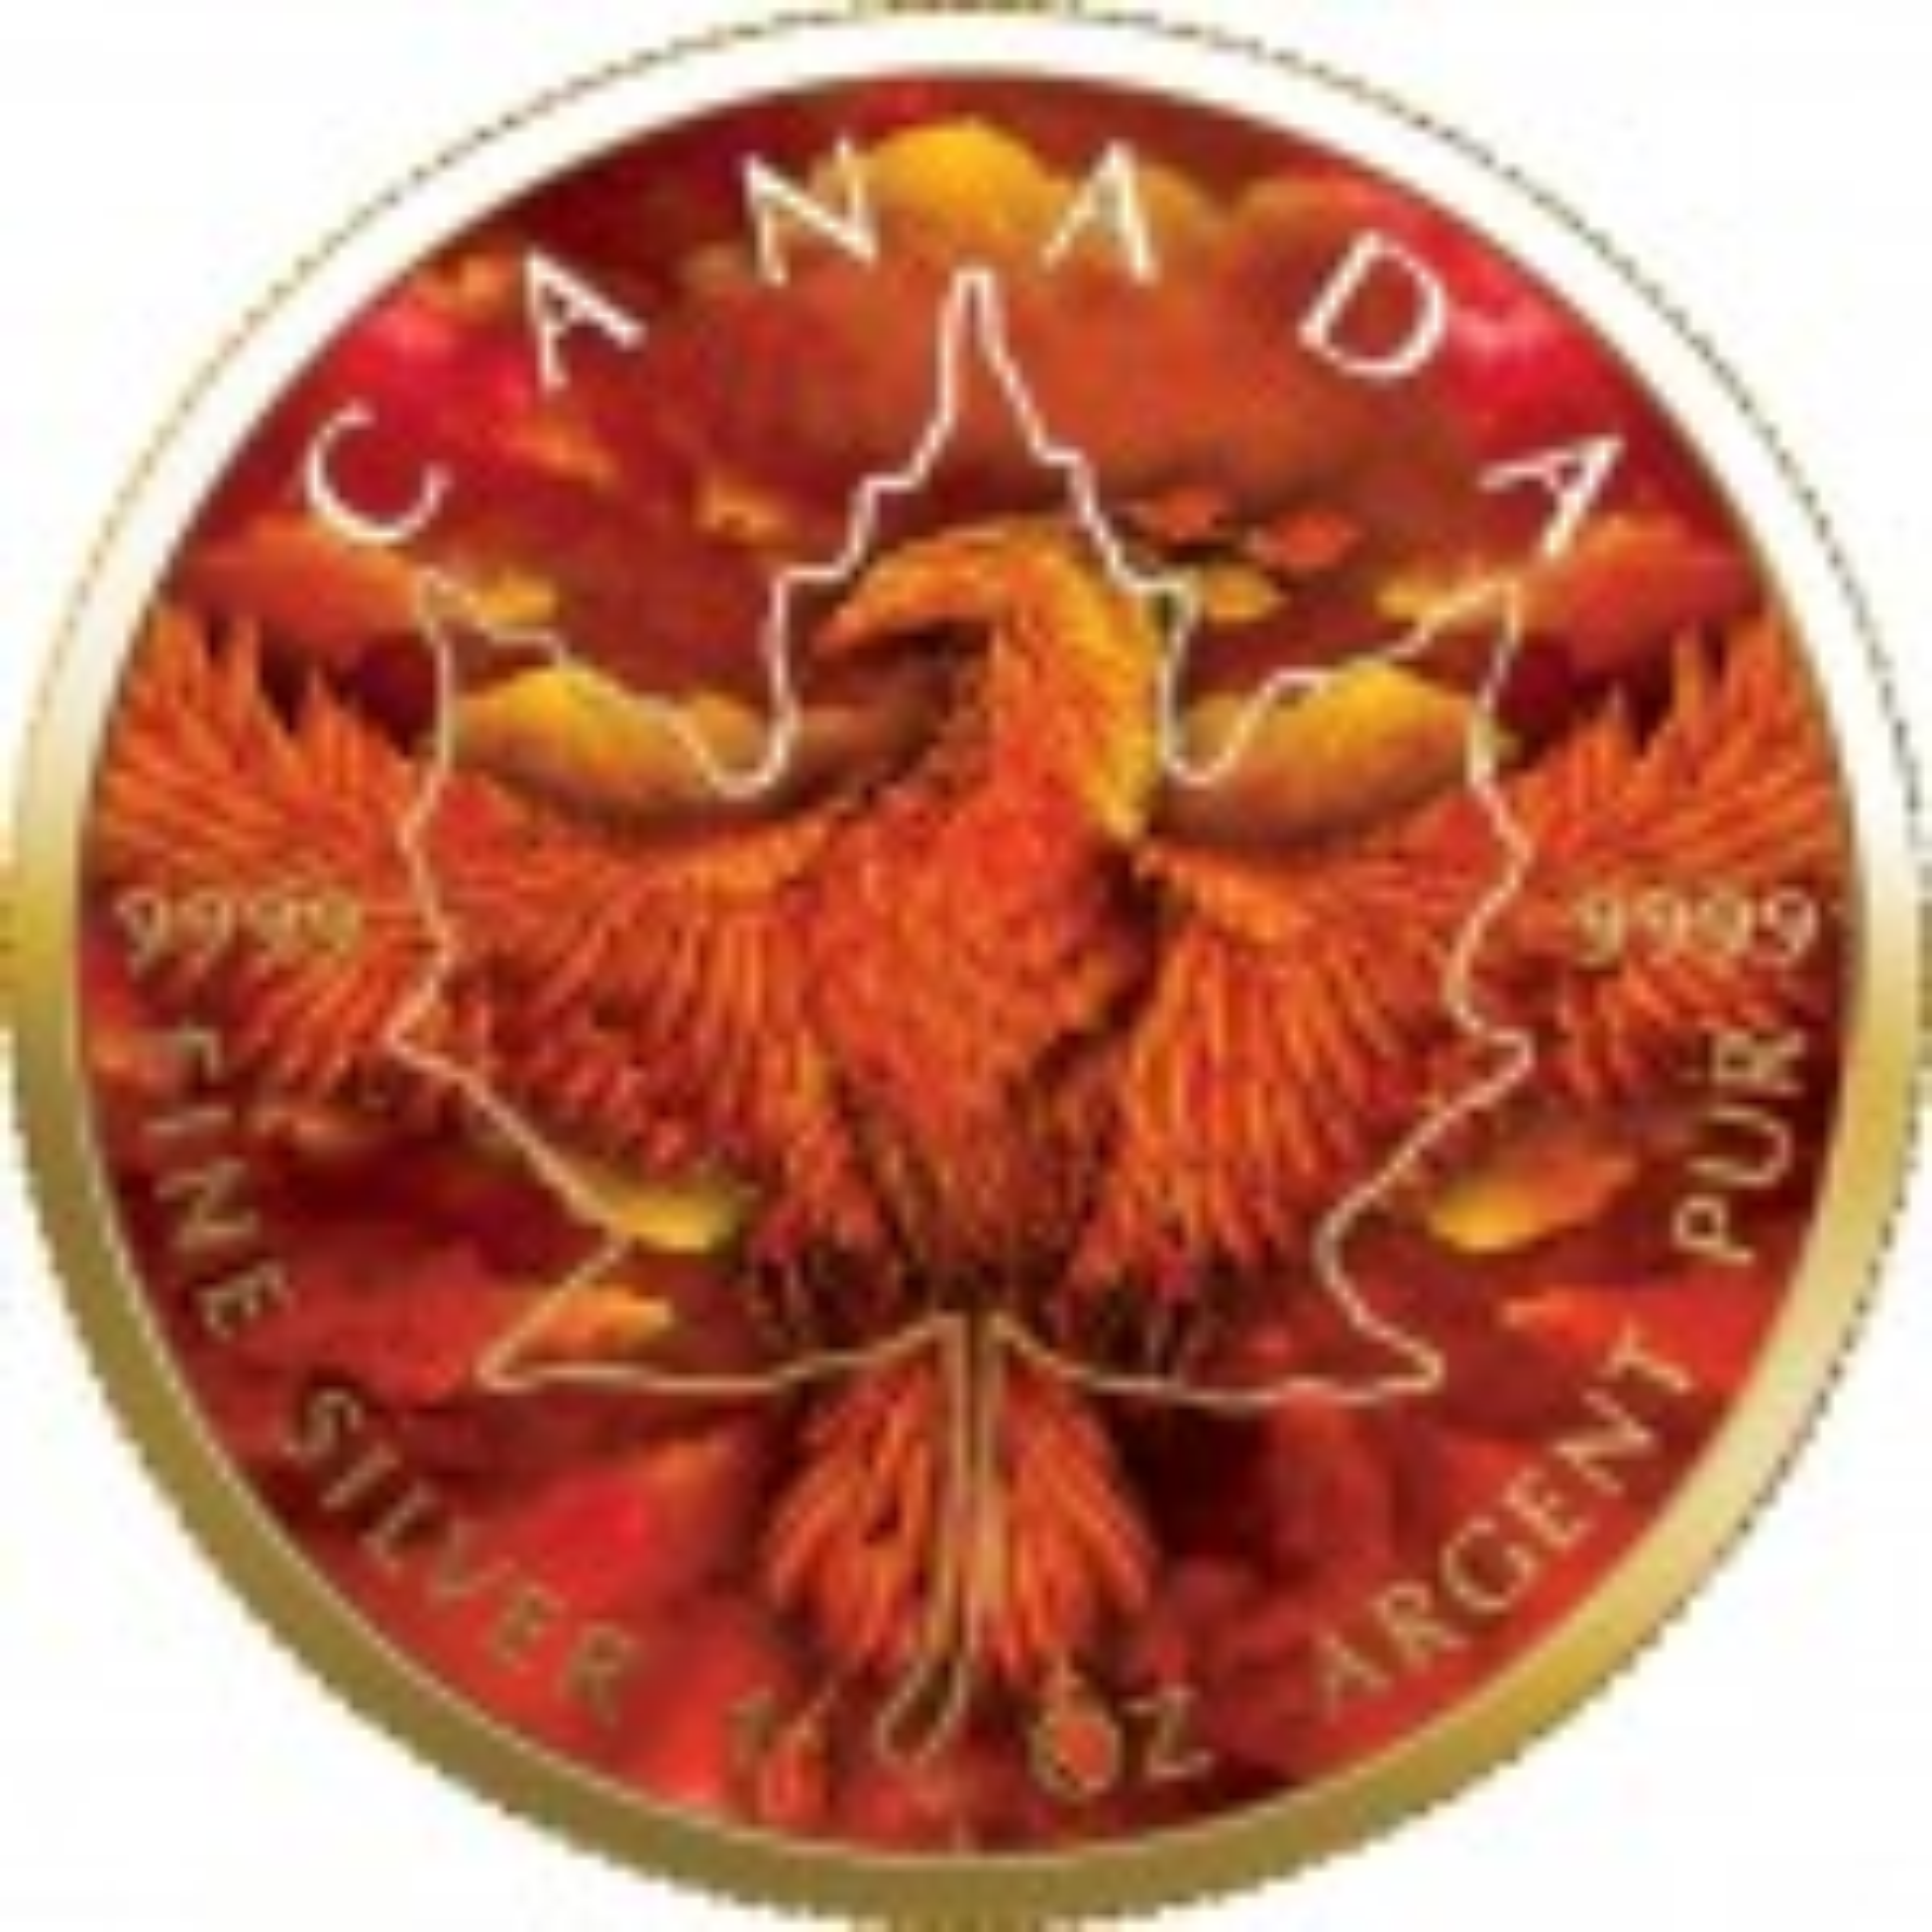 1 Troy ounce zilveren munt Maple Leaf Rising Phoenix 2020